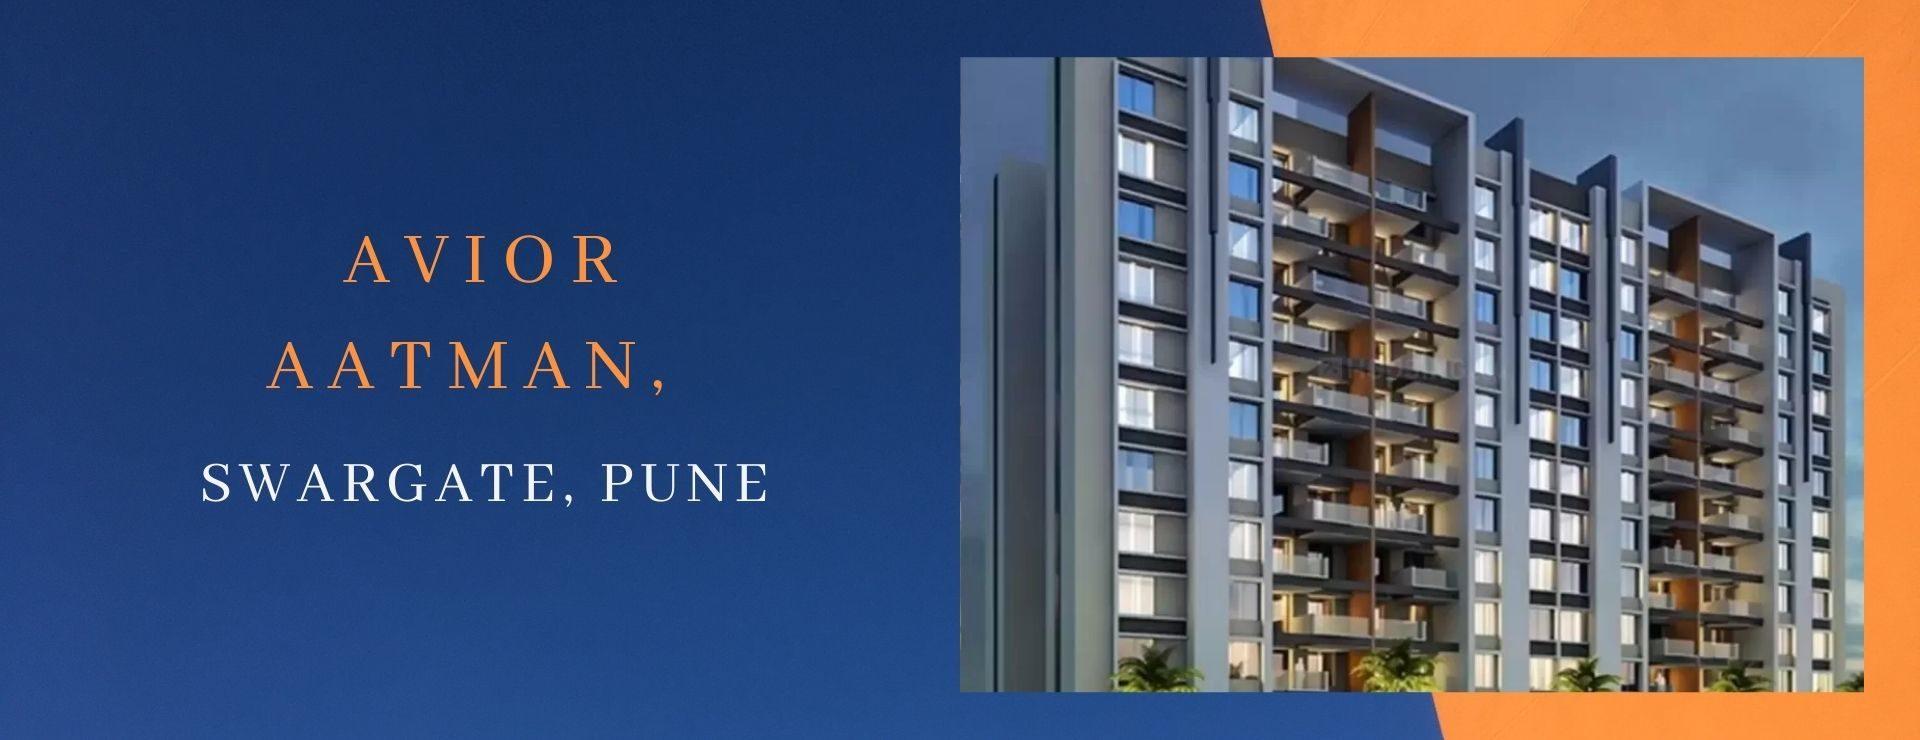 Avior Aatman,Swargate, Pune